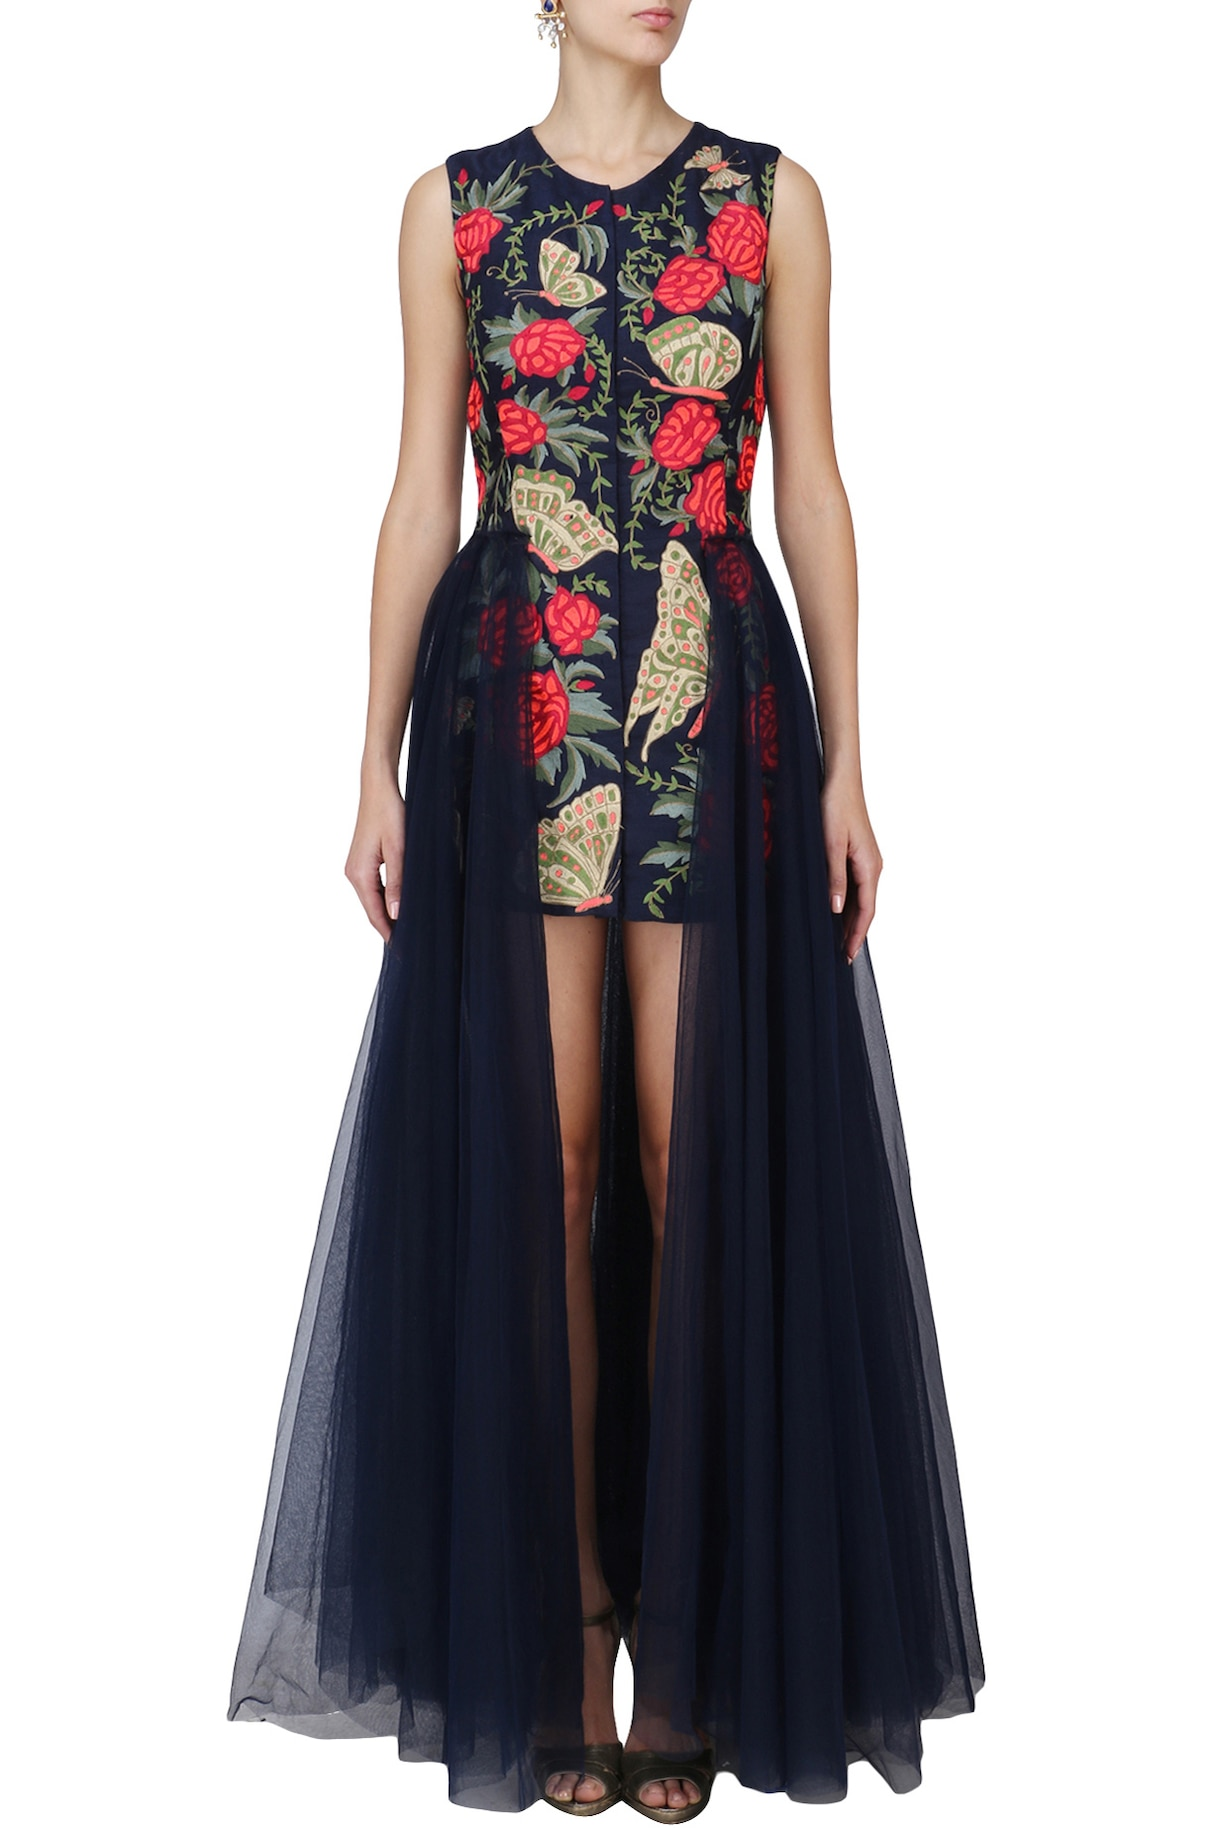 Aharin India Dresses